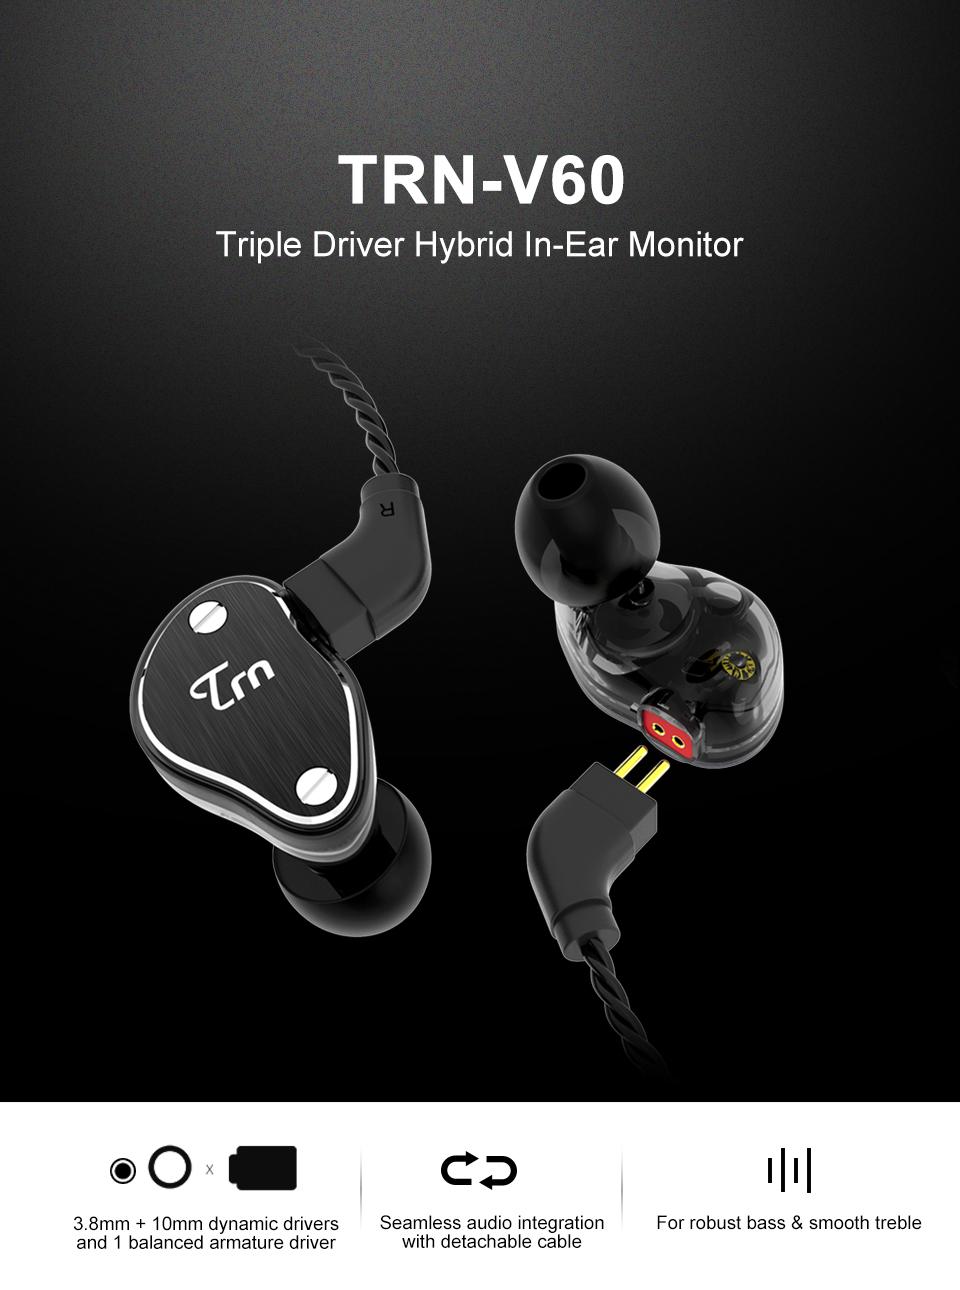 TRN V60 (มีไมค์) (แถมBigBagกันกระแทก) (เบสหนัก) สาย 4Core หูฟัง Hybrid 2 ไดร์เวอร์ (2 Balance Amature + 1 Dynamic ต่อข้าง) สีแดง